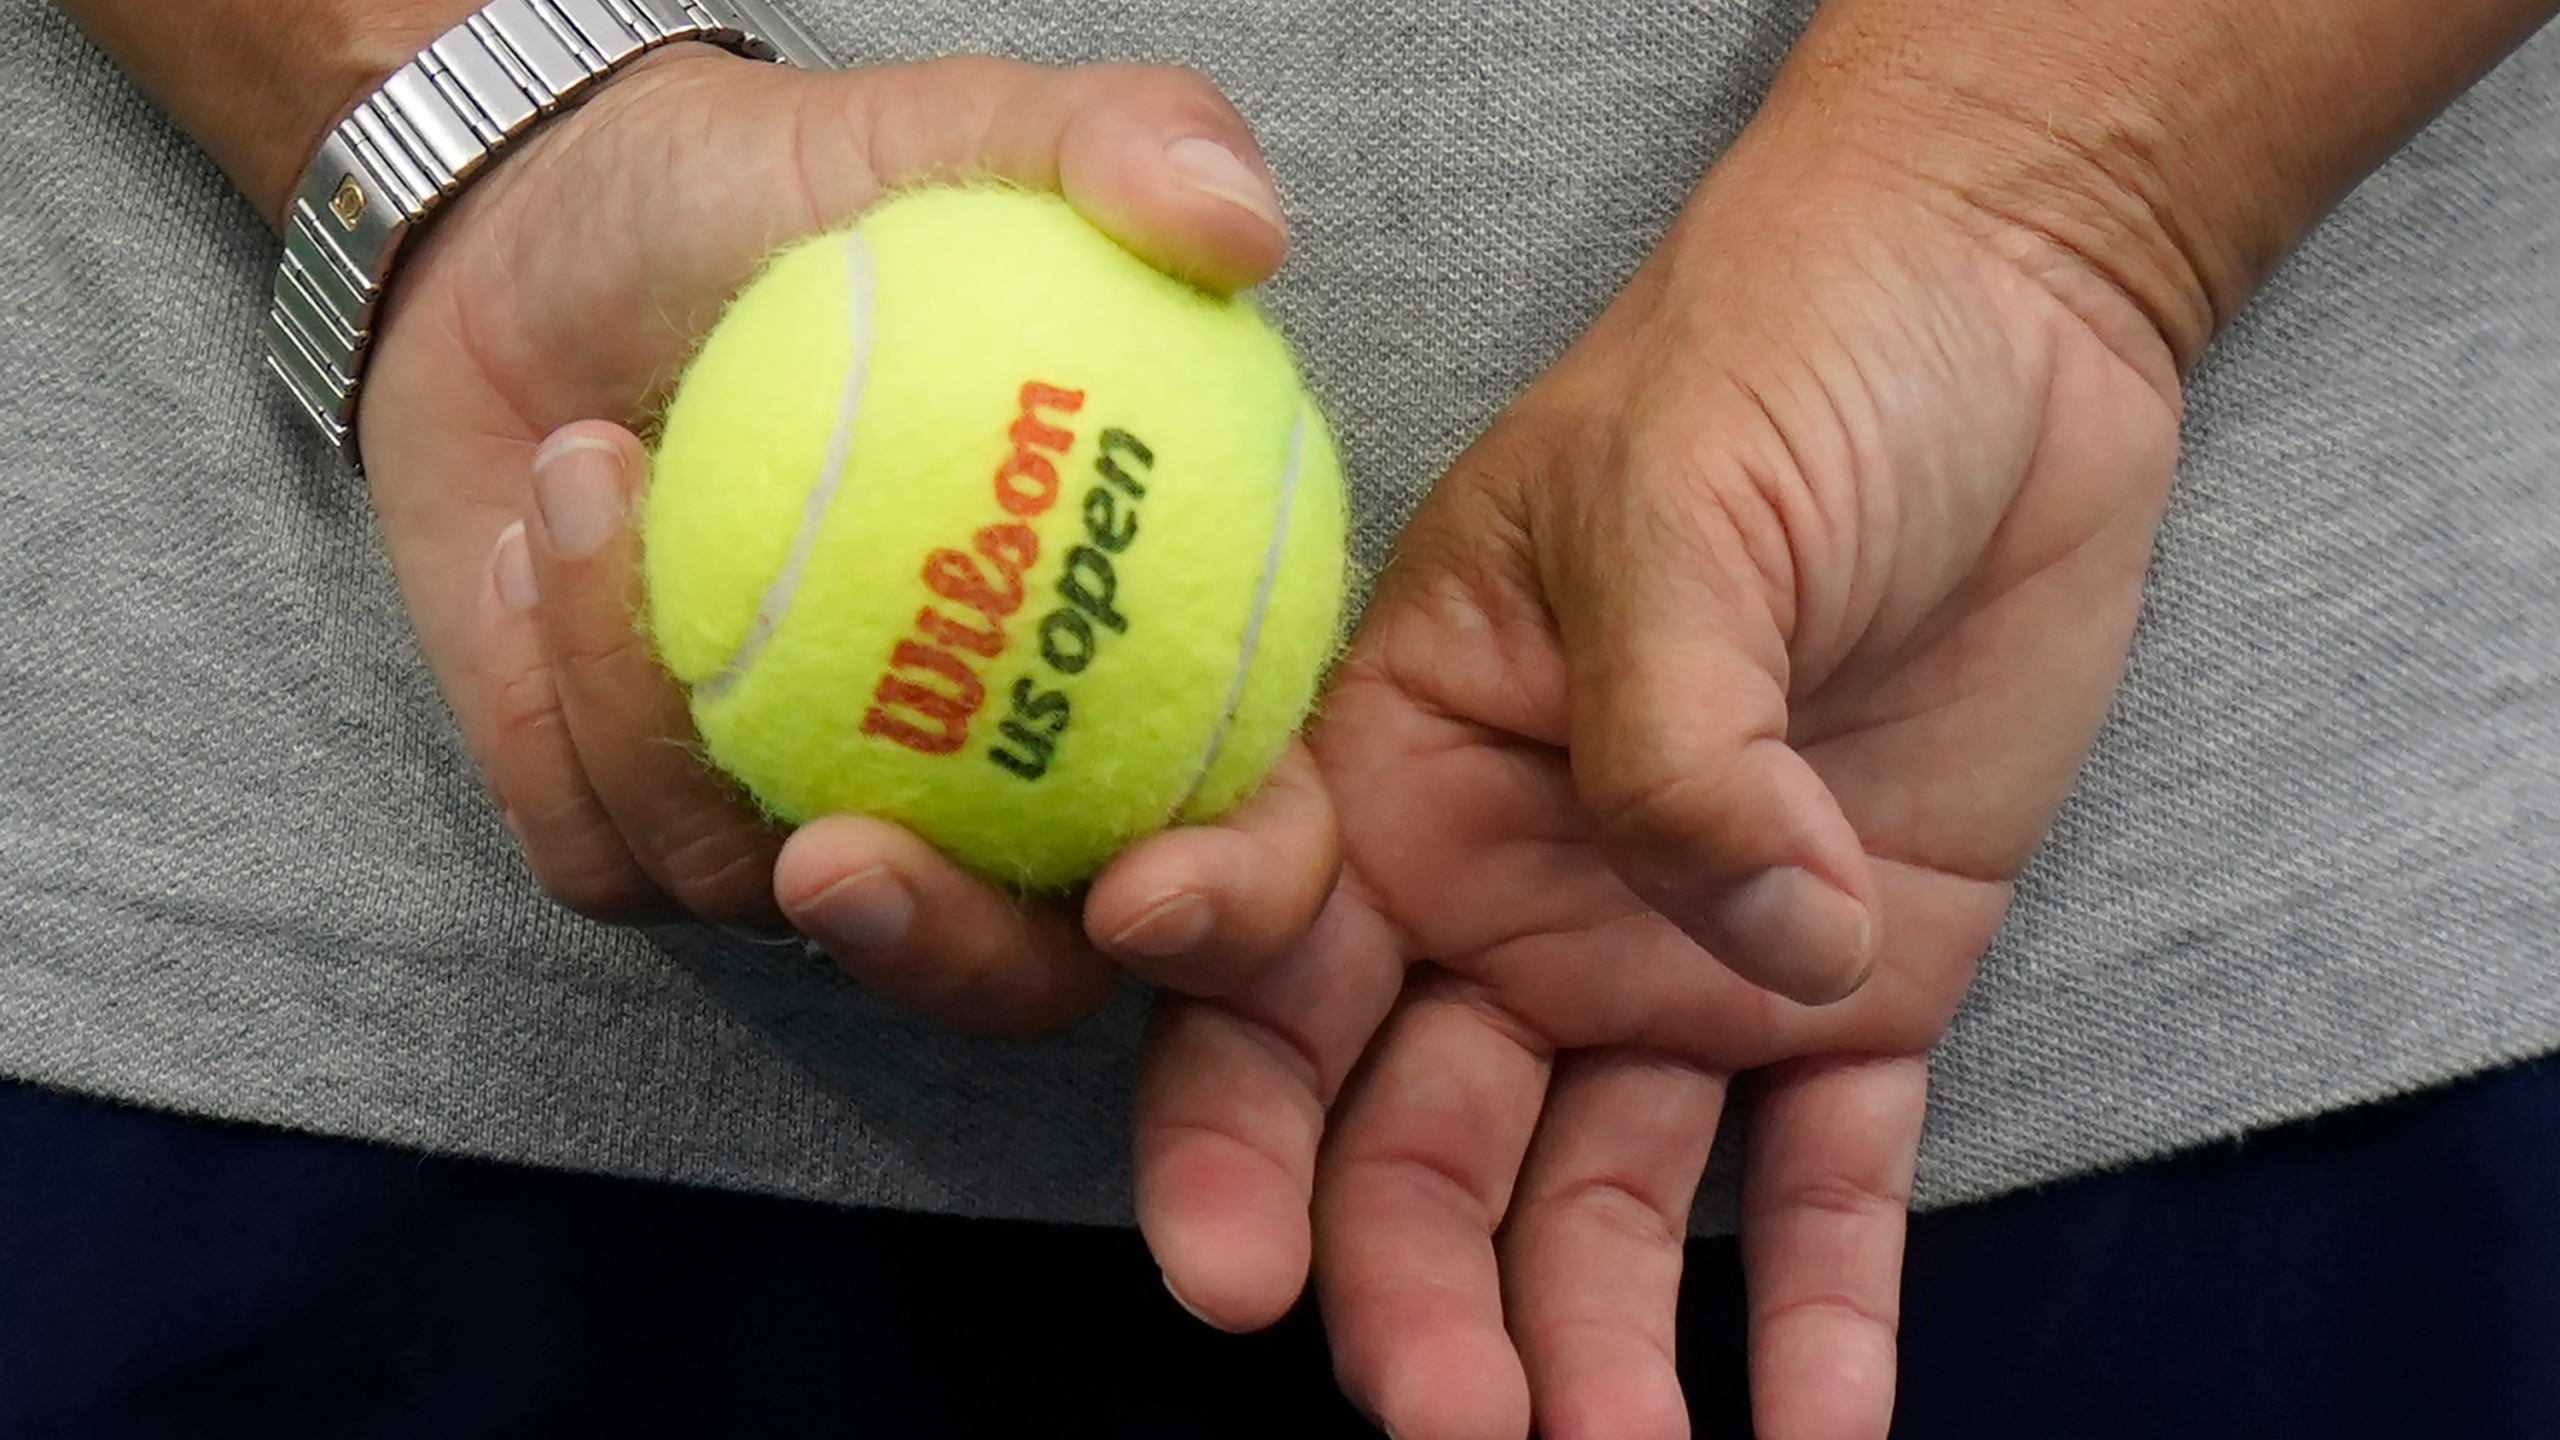 The Latest Still Perfect Novak Djokovic Advances At Us Open Krqe News 13